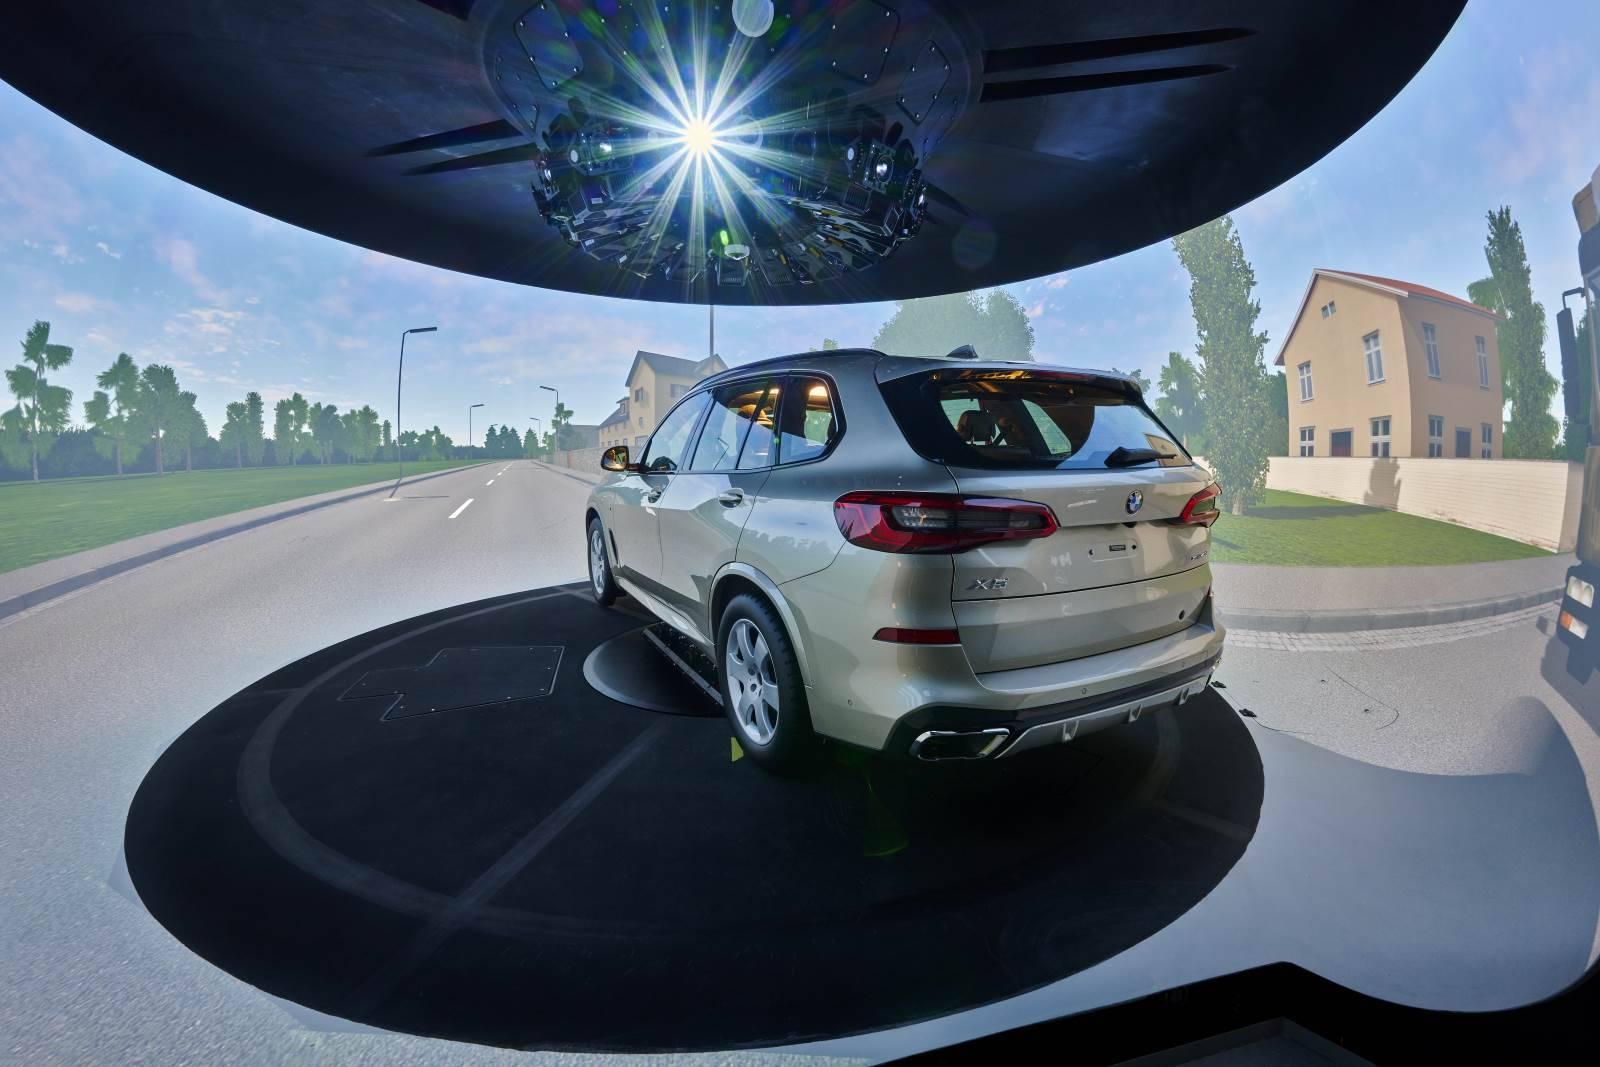 IAA Mobility 2021 - в центре внимания BMW Group Innovation Workshop 8